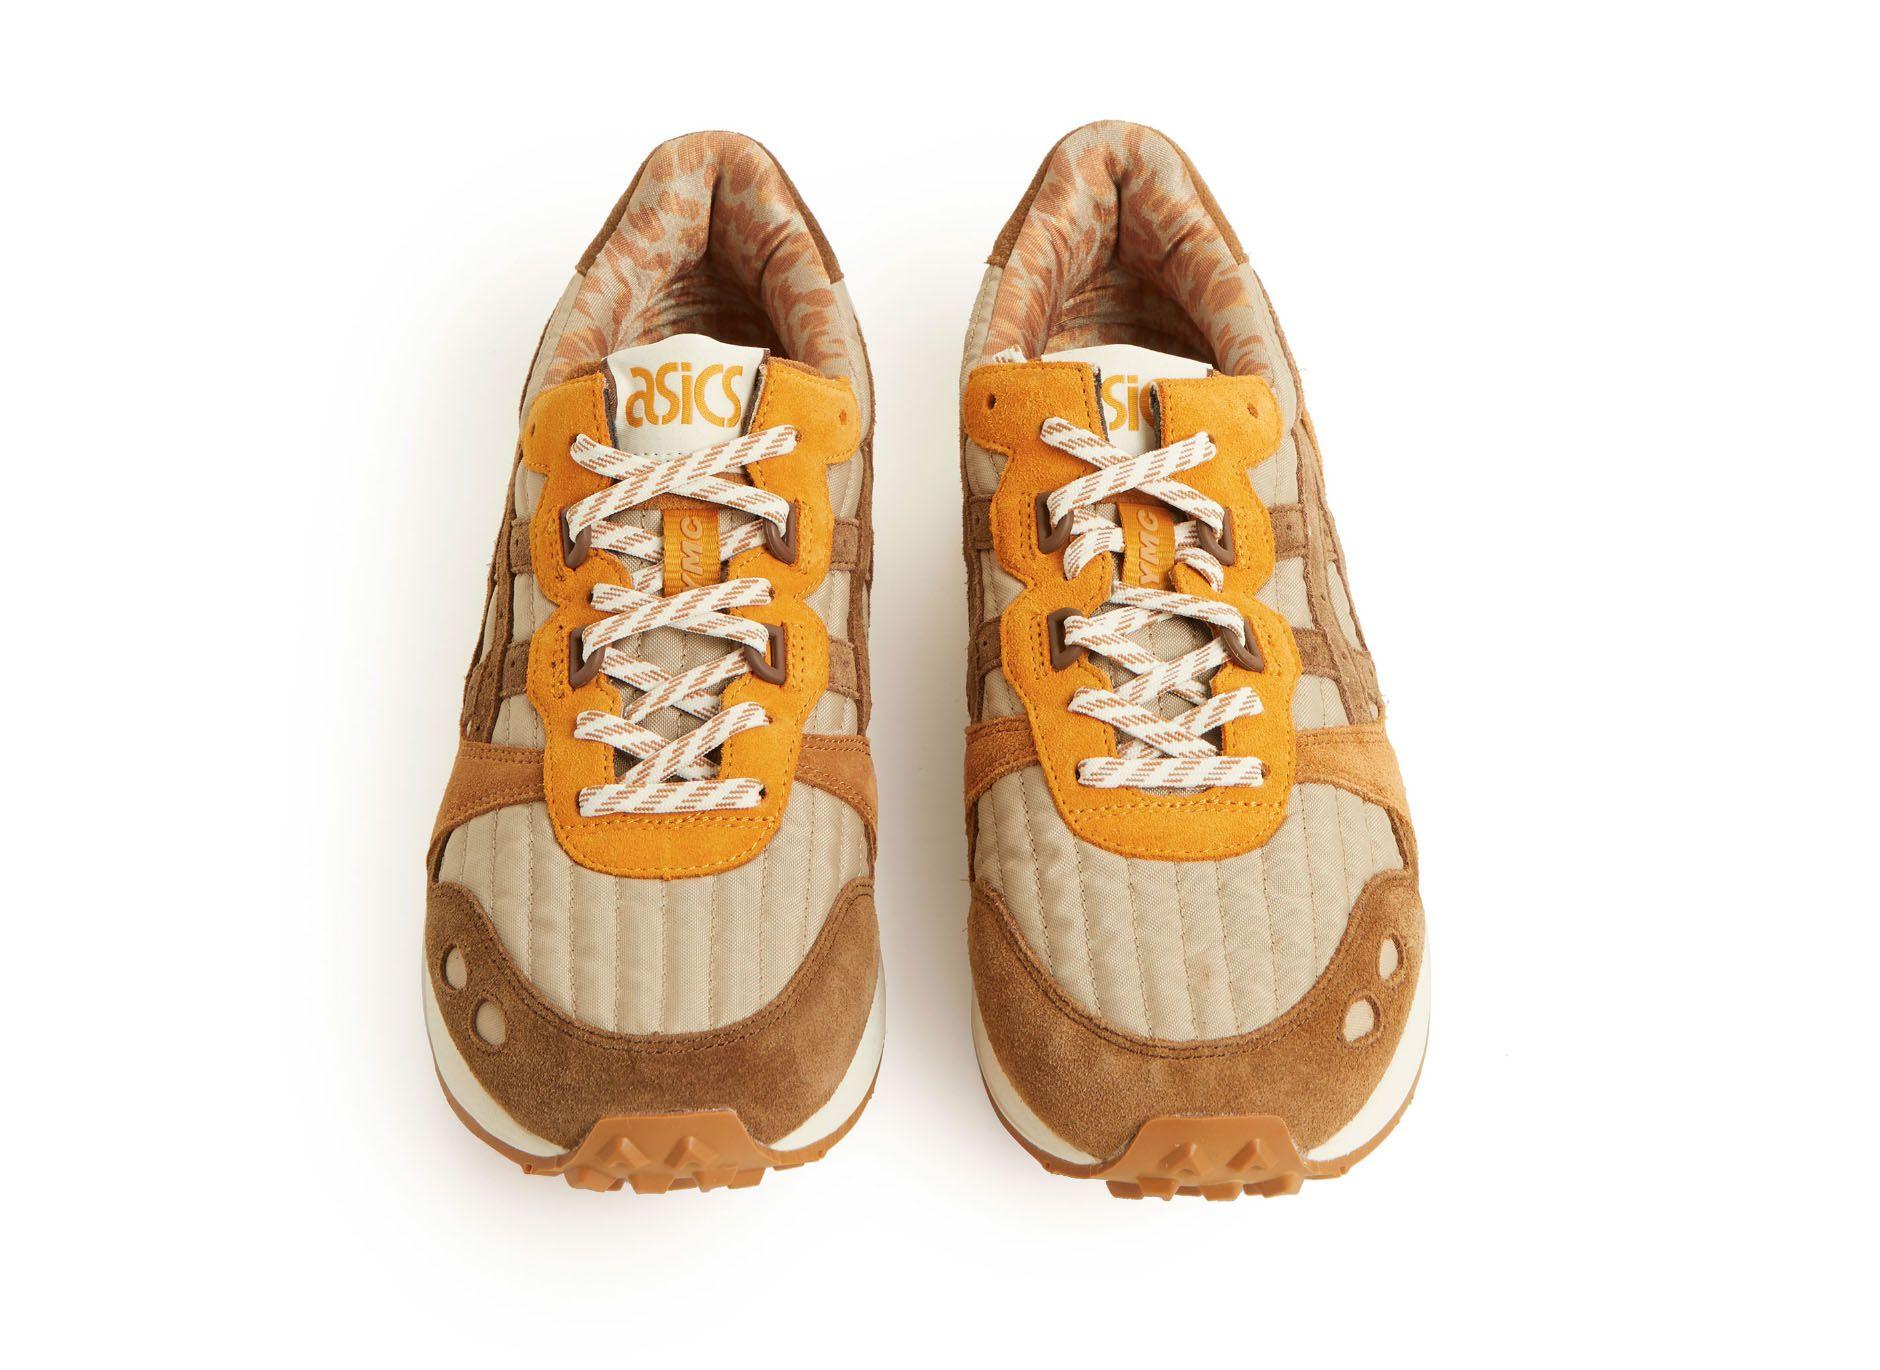 YMC x AsicsTiger Gel-Lyte XT – Sneakers